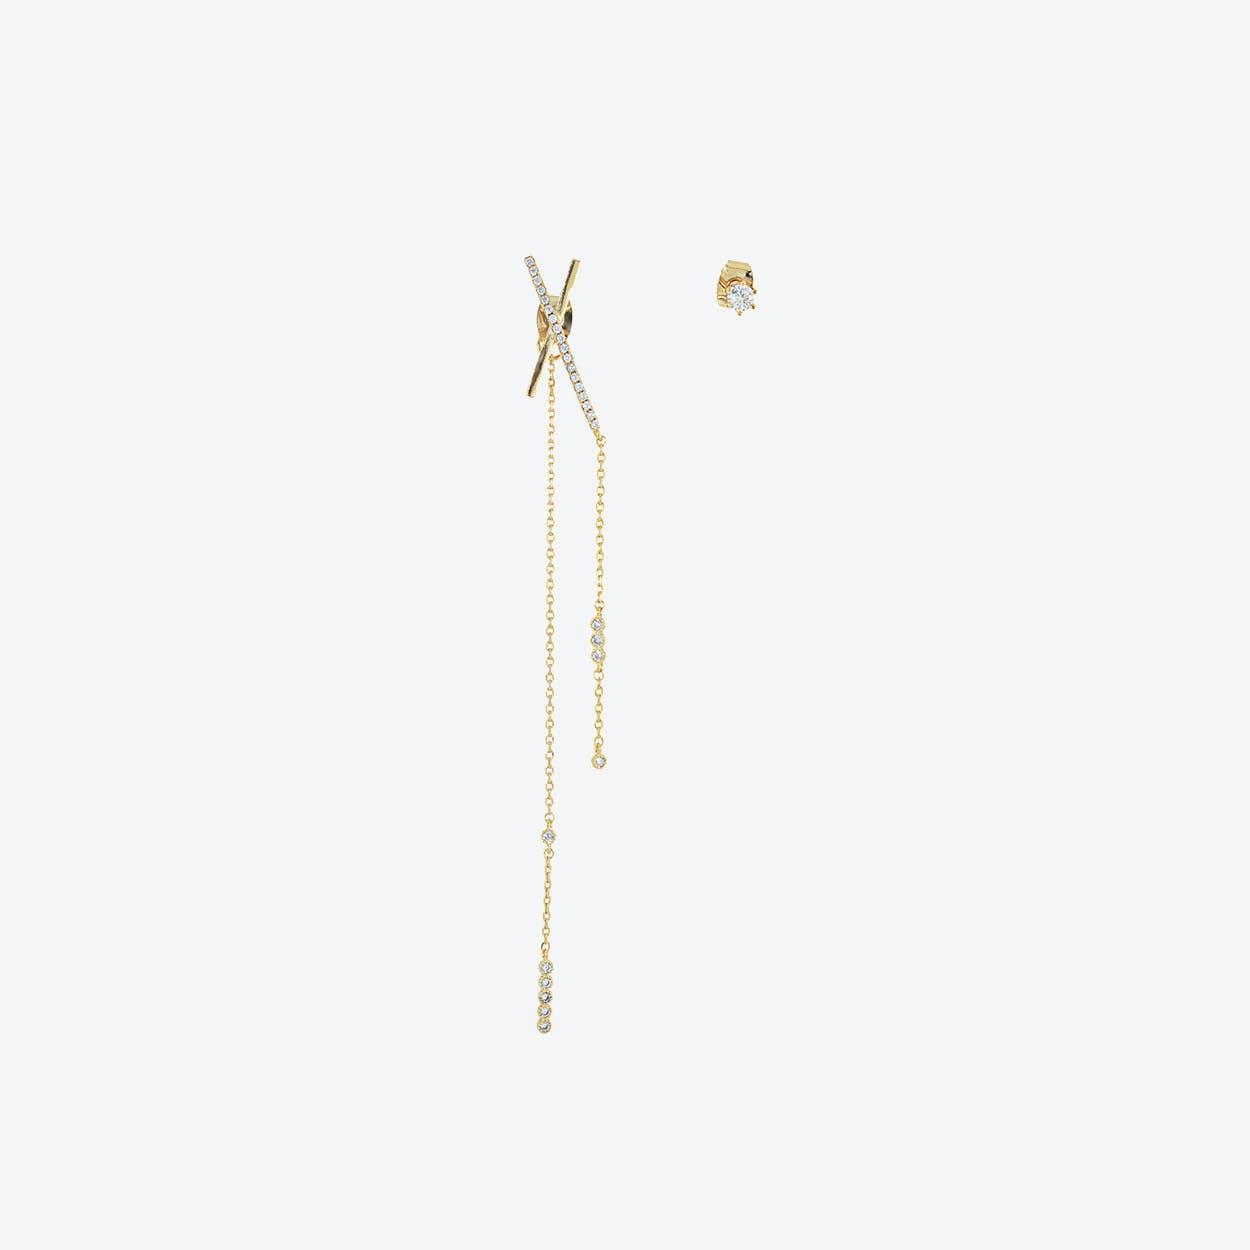 Gold Asymmetric Statement Bar Earrings